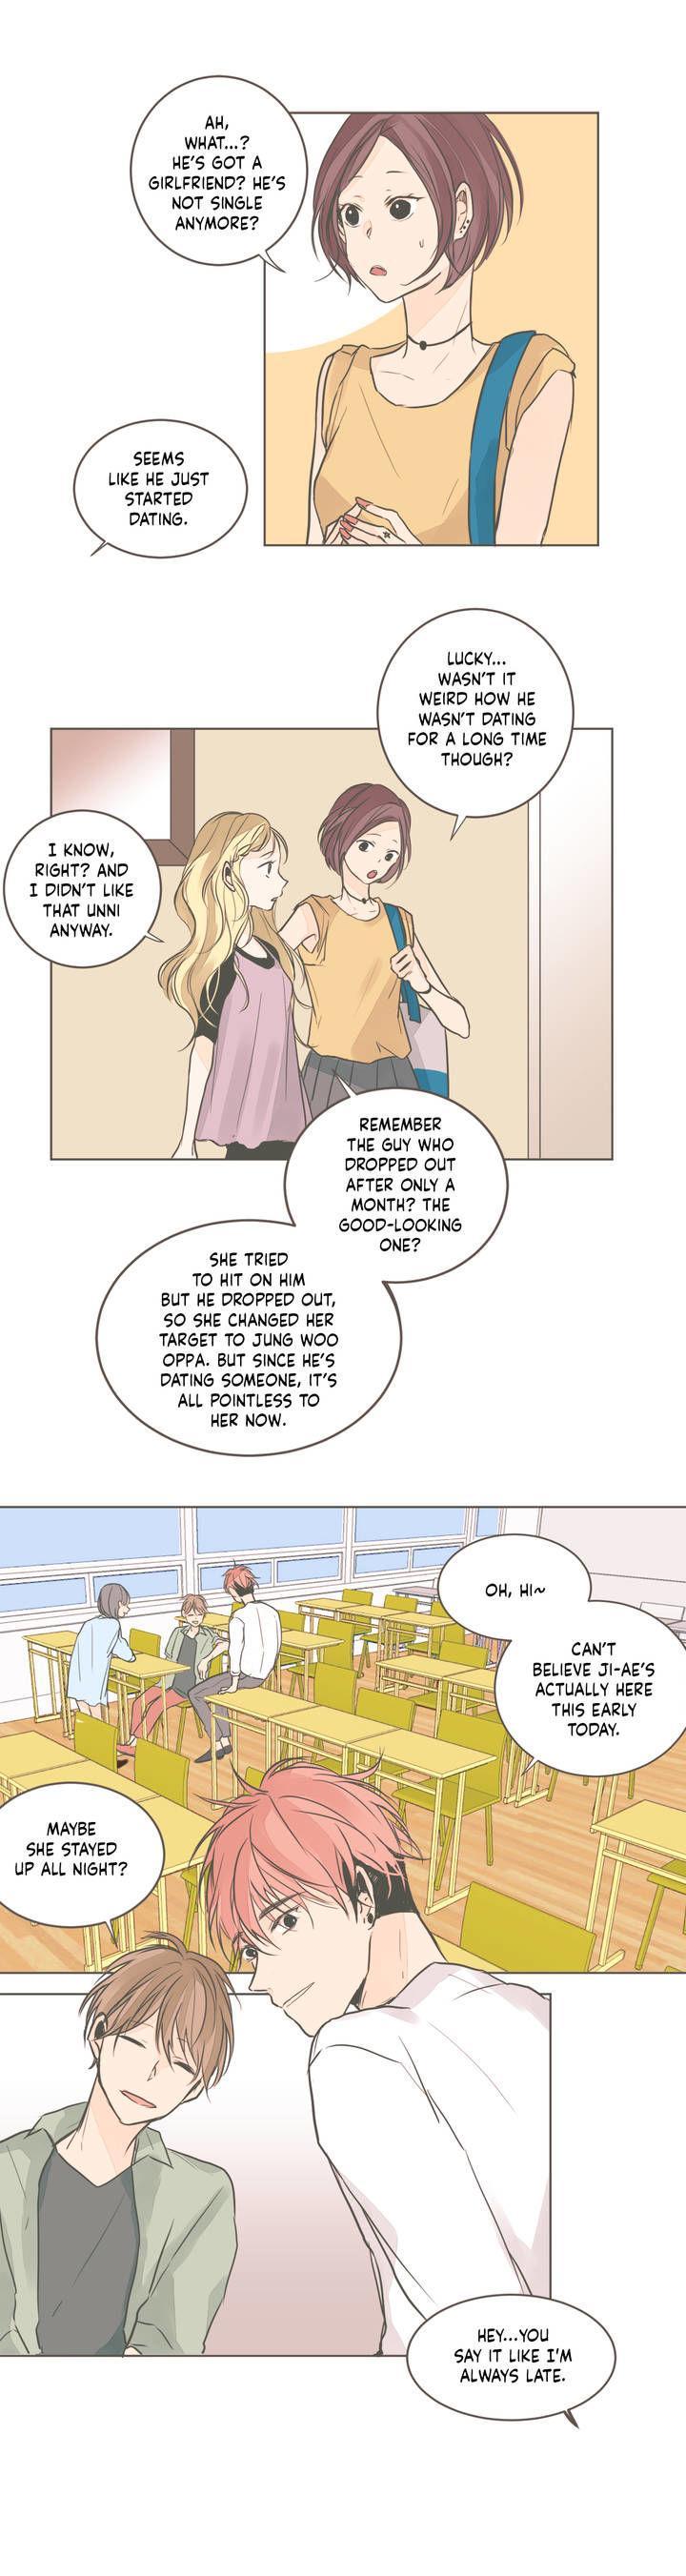 Consumua And Sudutist! - Chapter 6